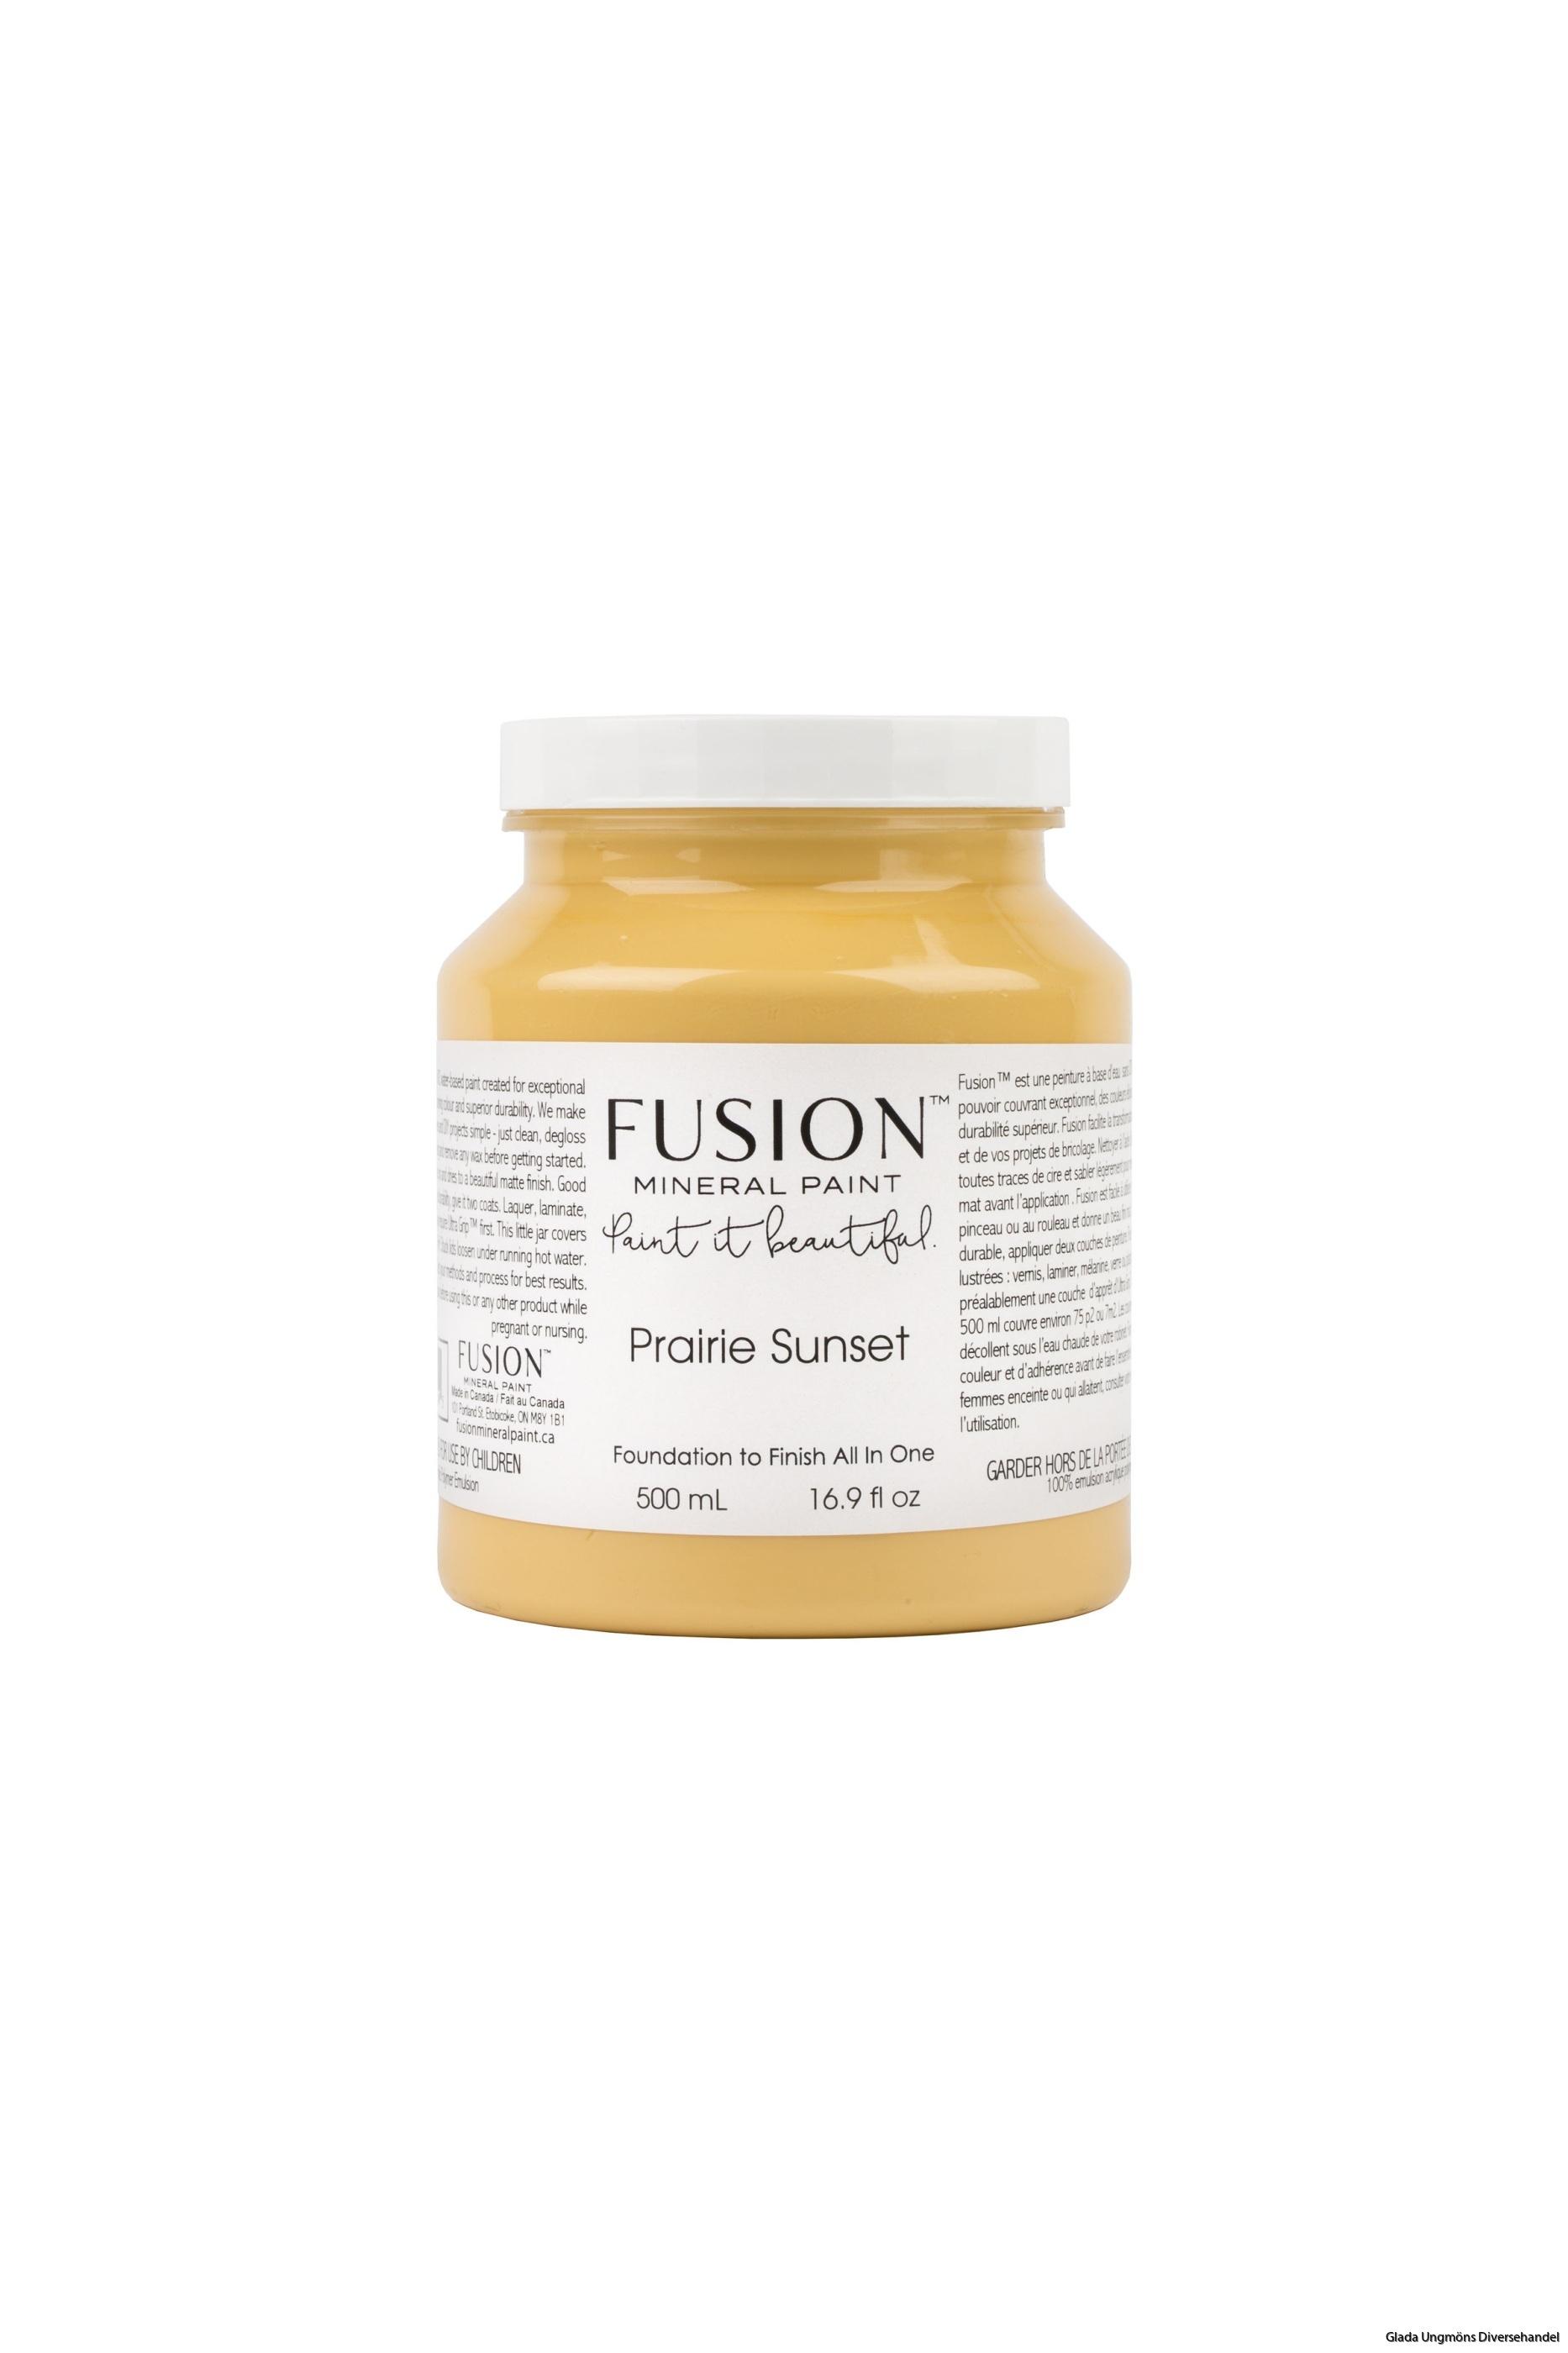 fusion_mineral_paint-prairiesunset-pint